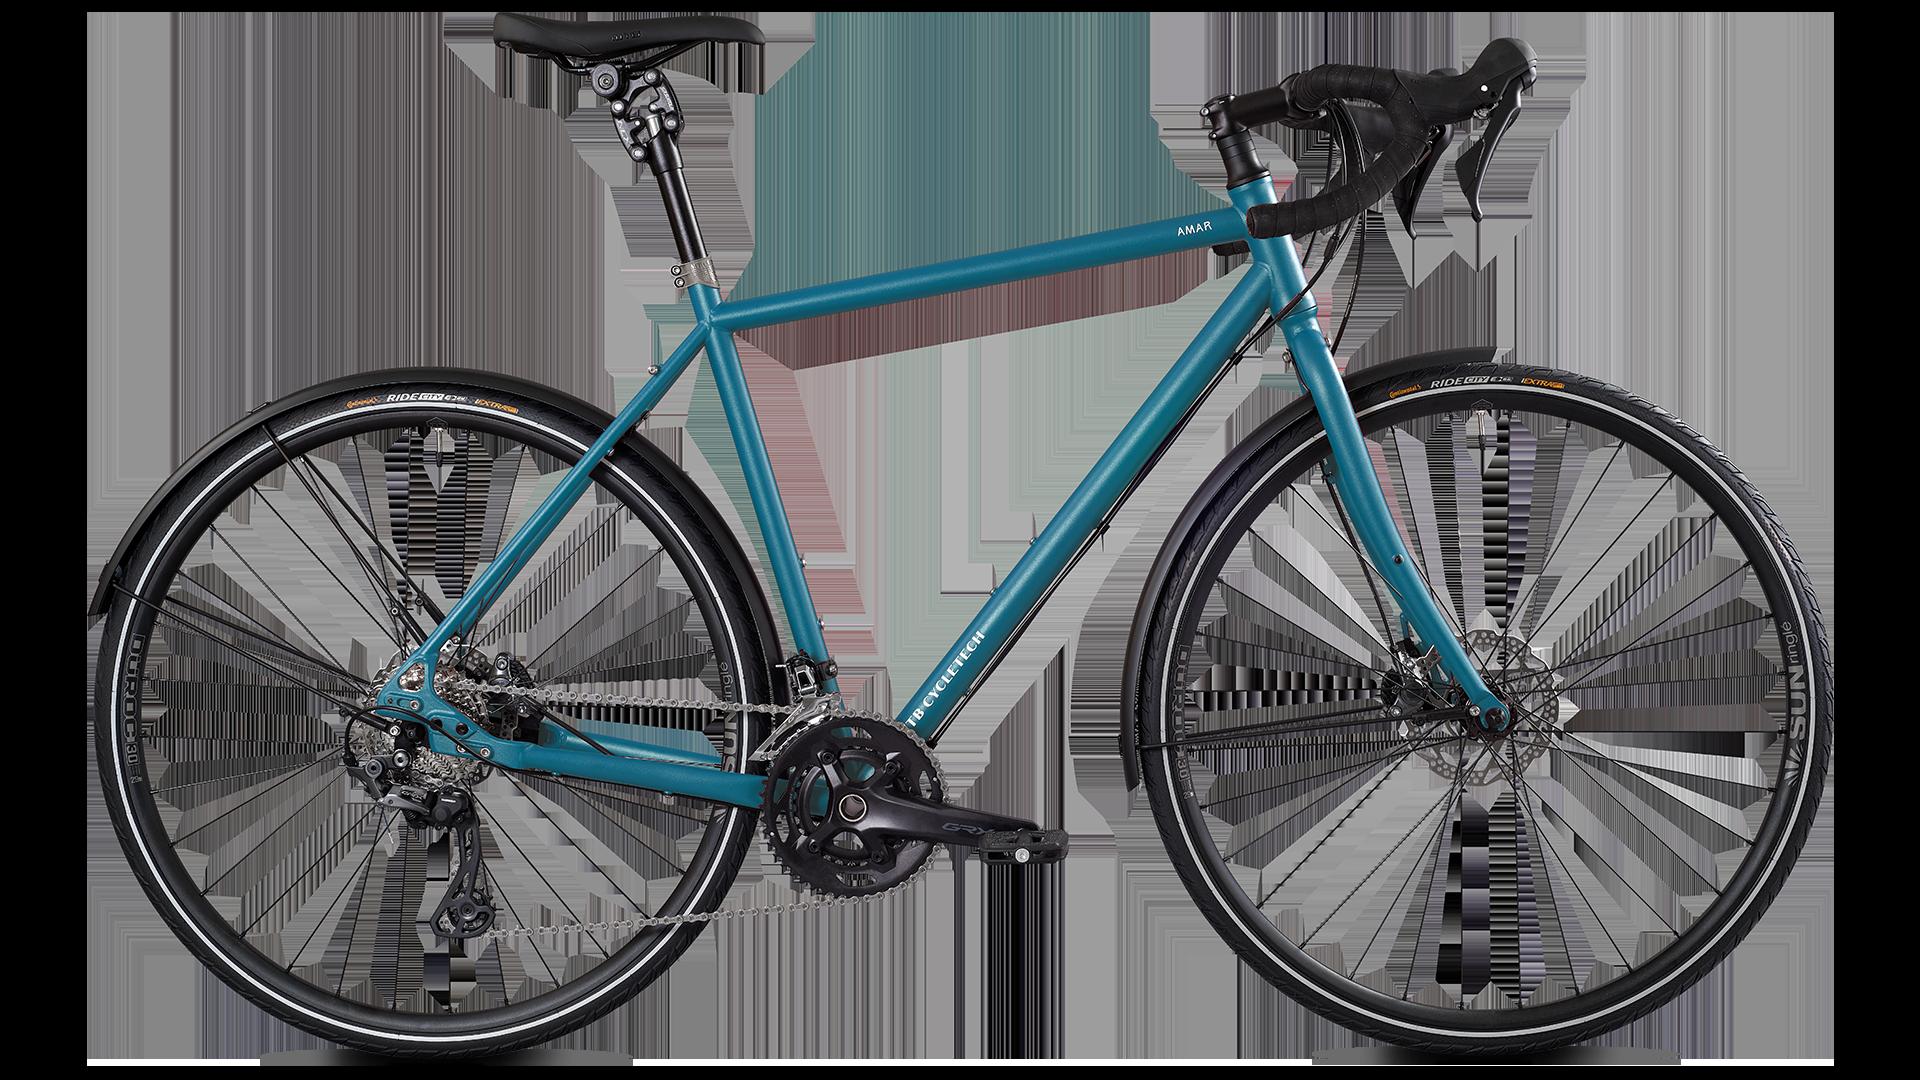 Modell - Amar G - MTB Cycletech